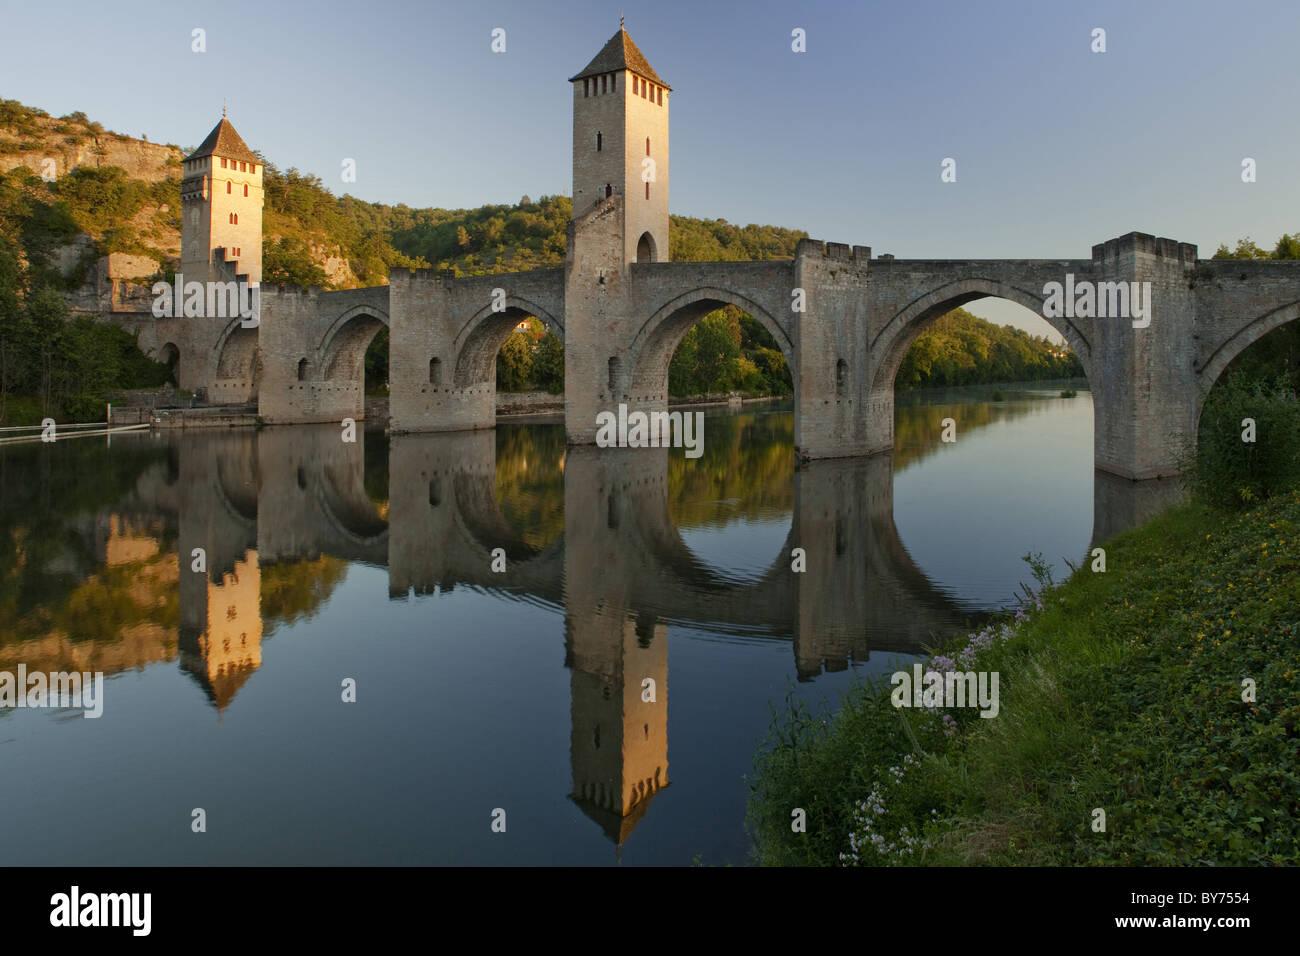 Fourteenth century stone arch bridge crossing the Lot River, Pont Valentre, Valentre bridge, Cahors, Via Podiensis, - Stock Image